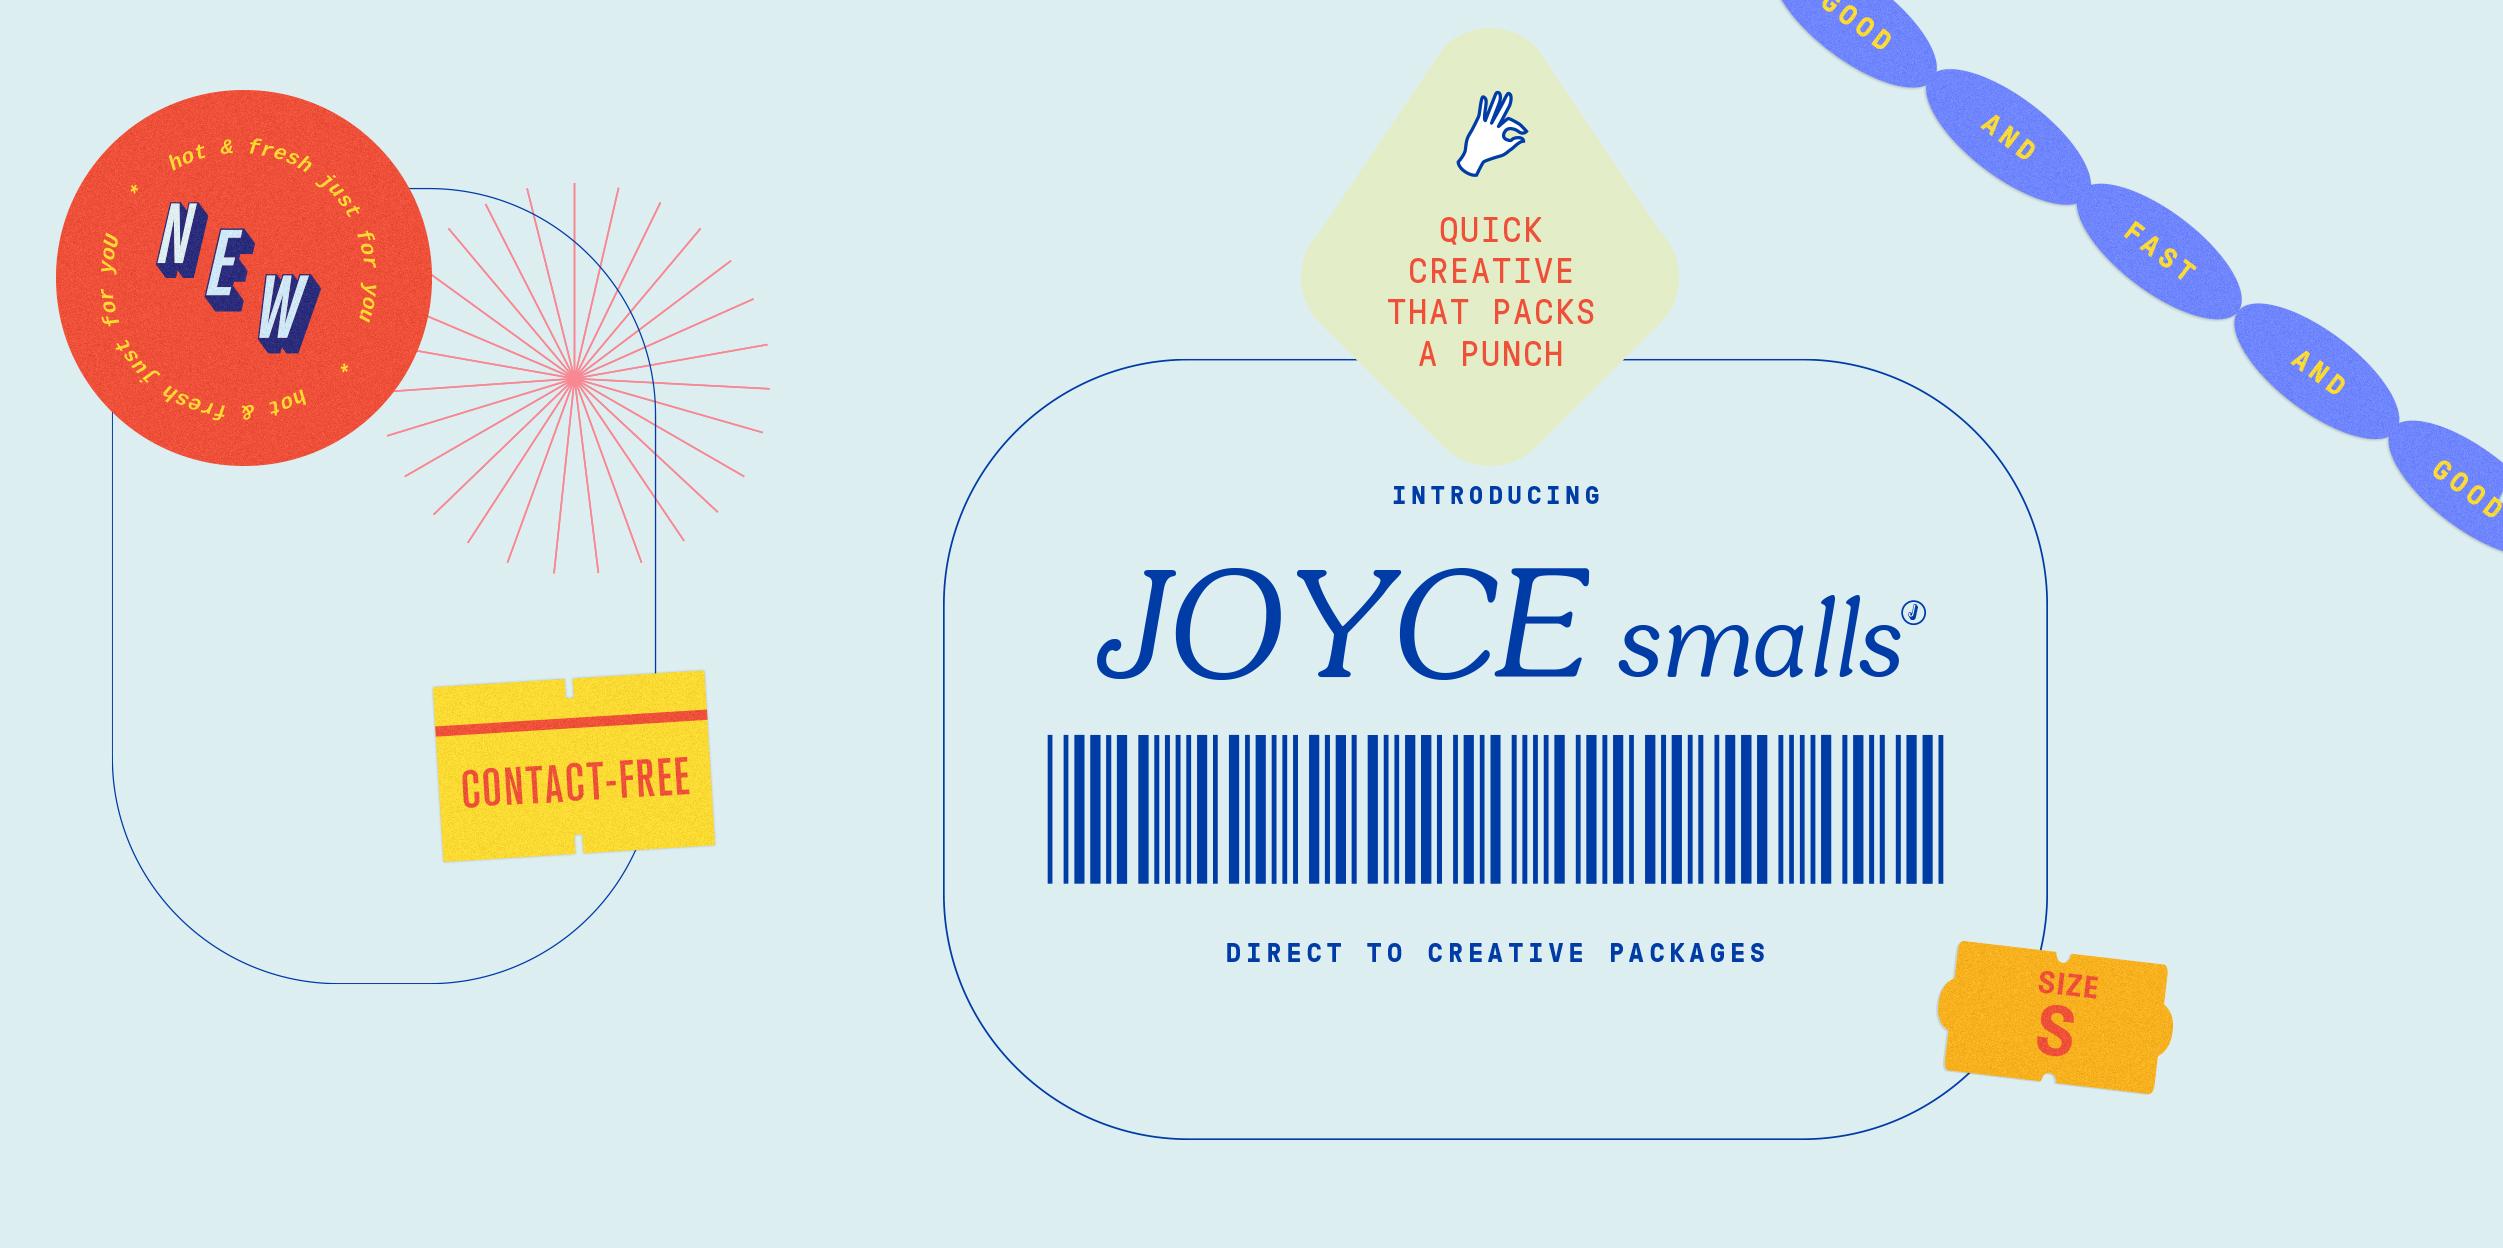 Joyce smalls image